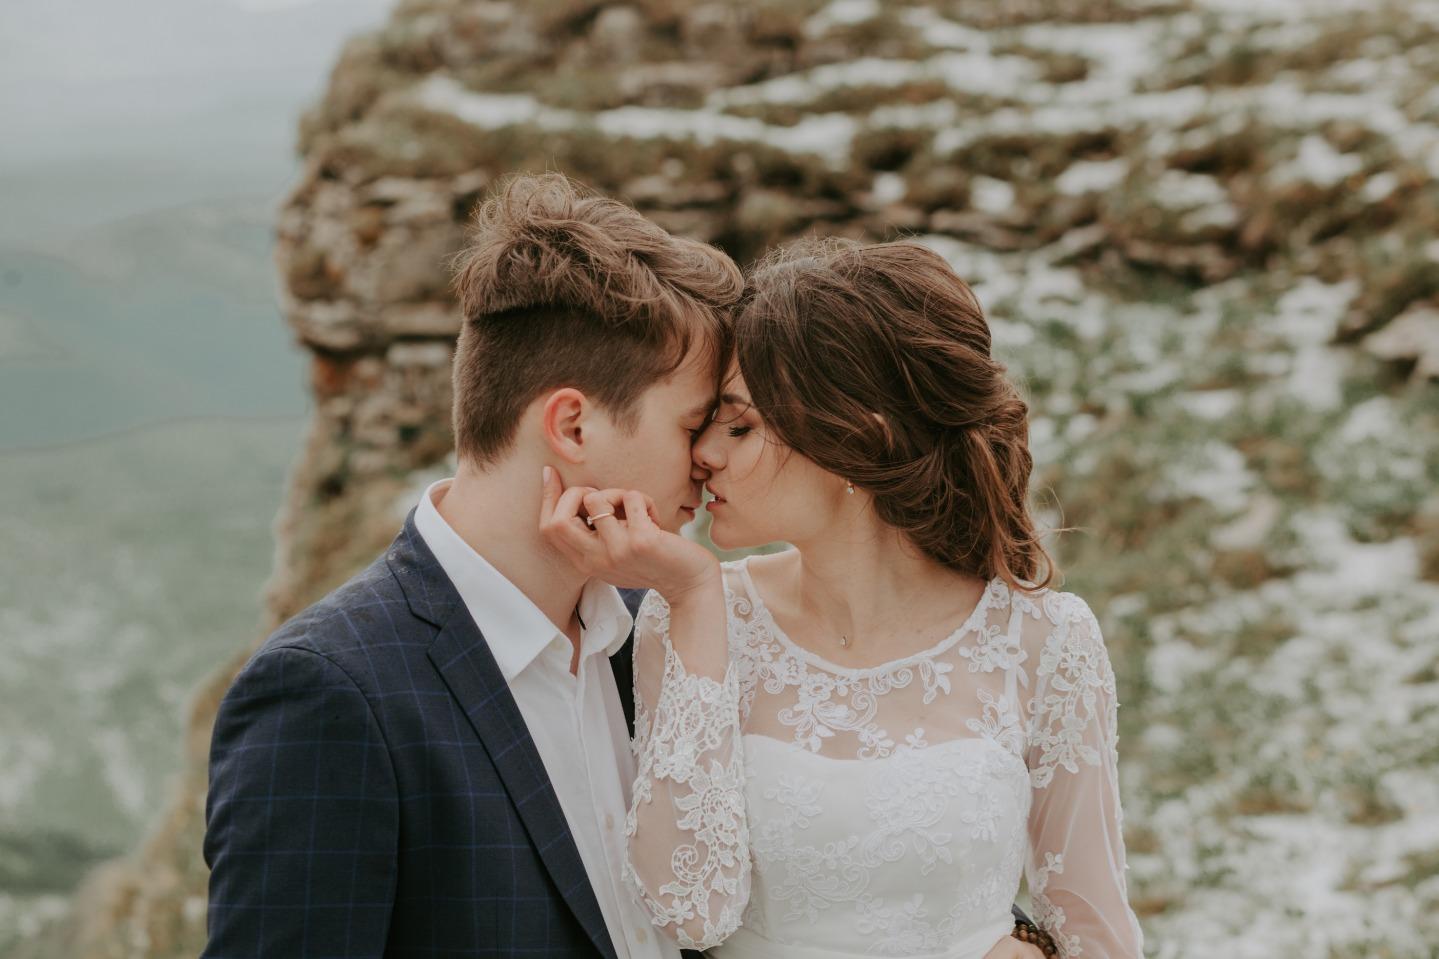 Inspiration in the mountains: эко-свадьба в горах